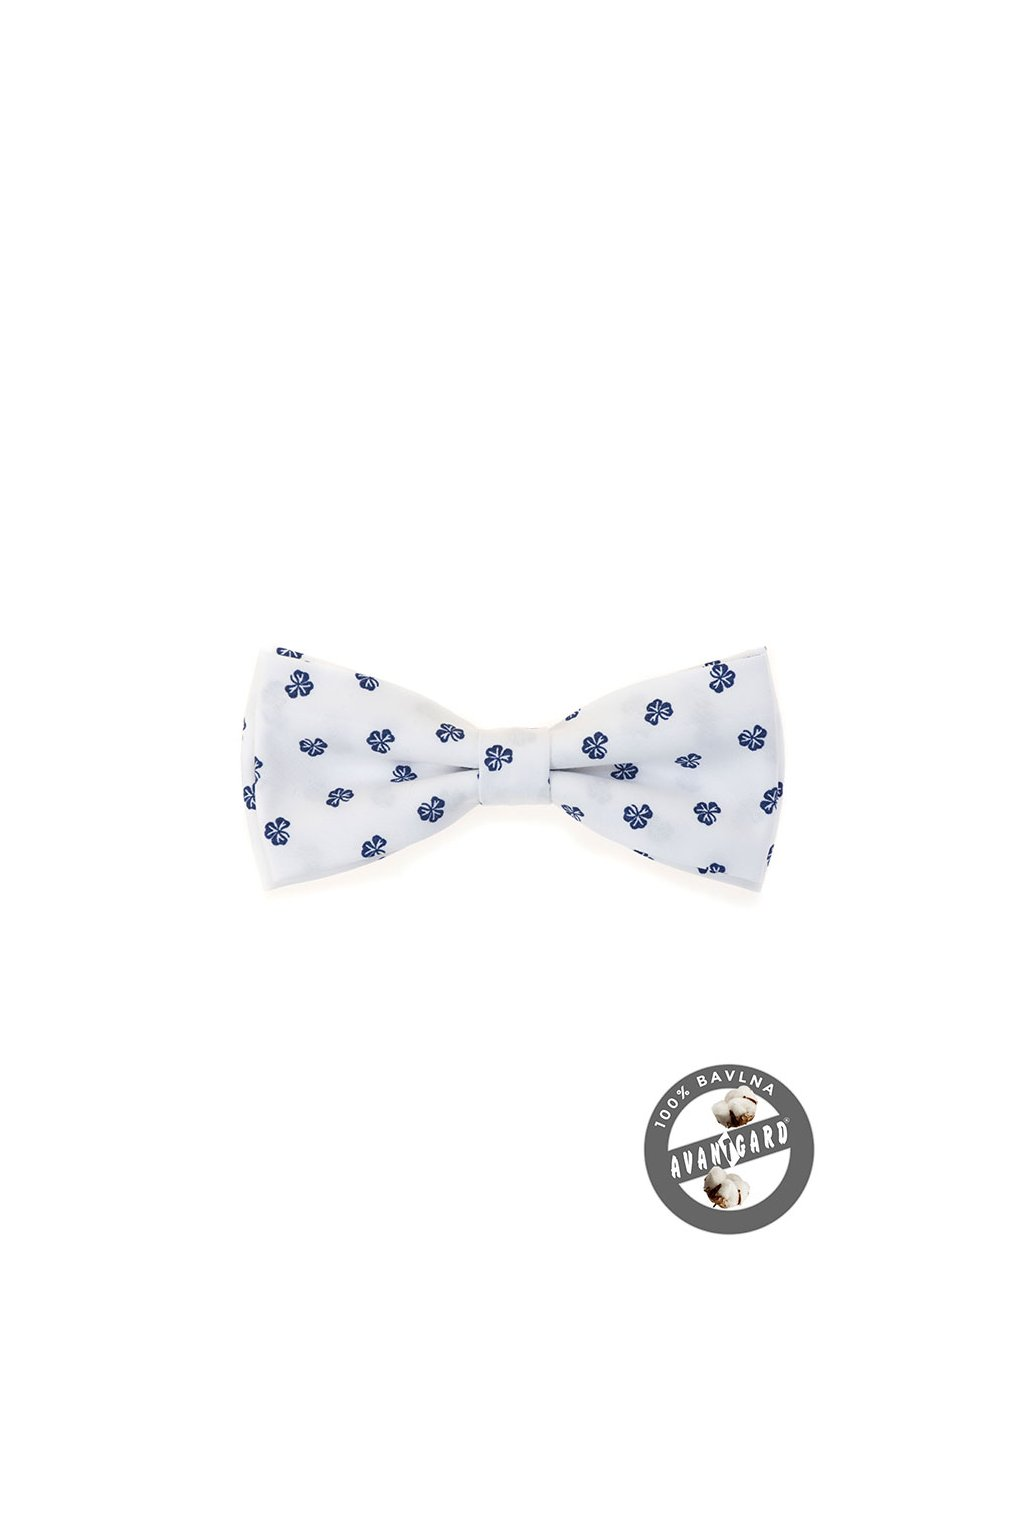 Motýlek PREMIUM bavlněný bílá/modrá 600 - 5198